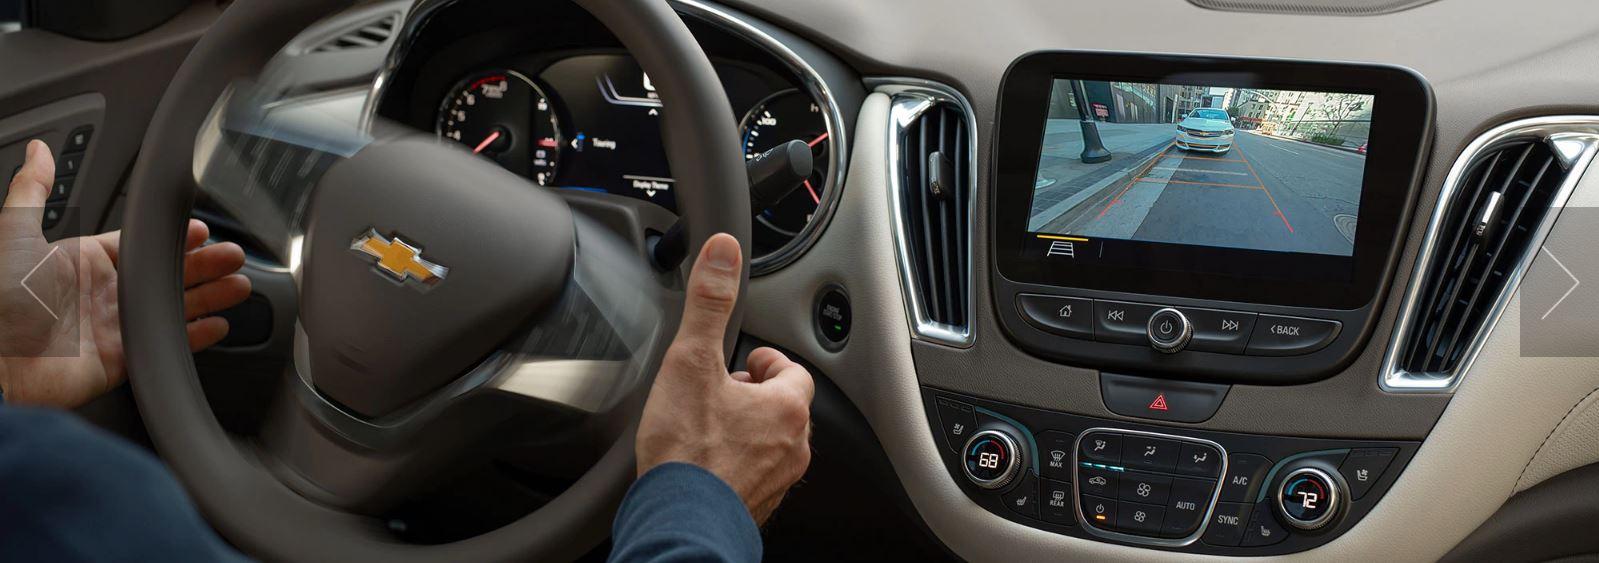 2020 Chevrolet Malibu Interior